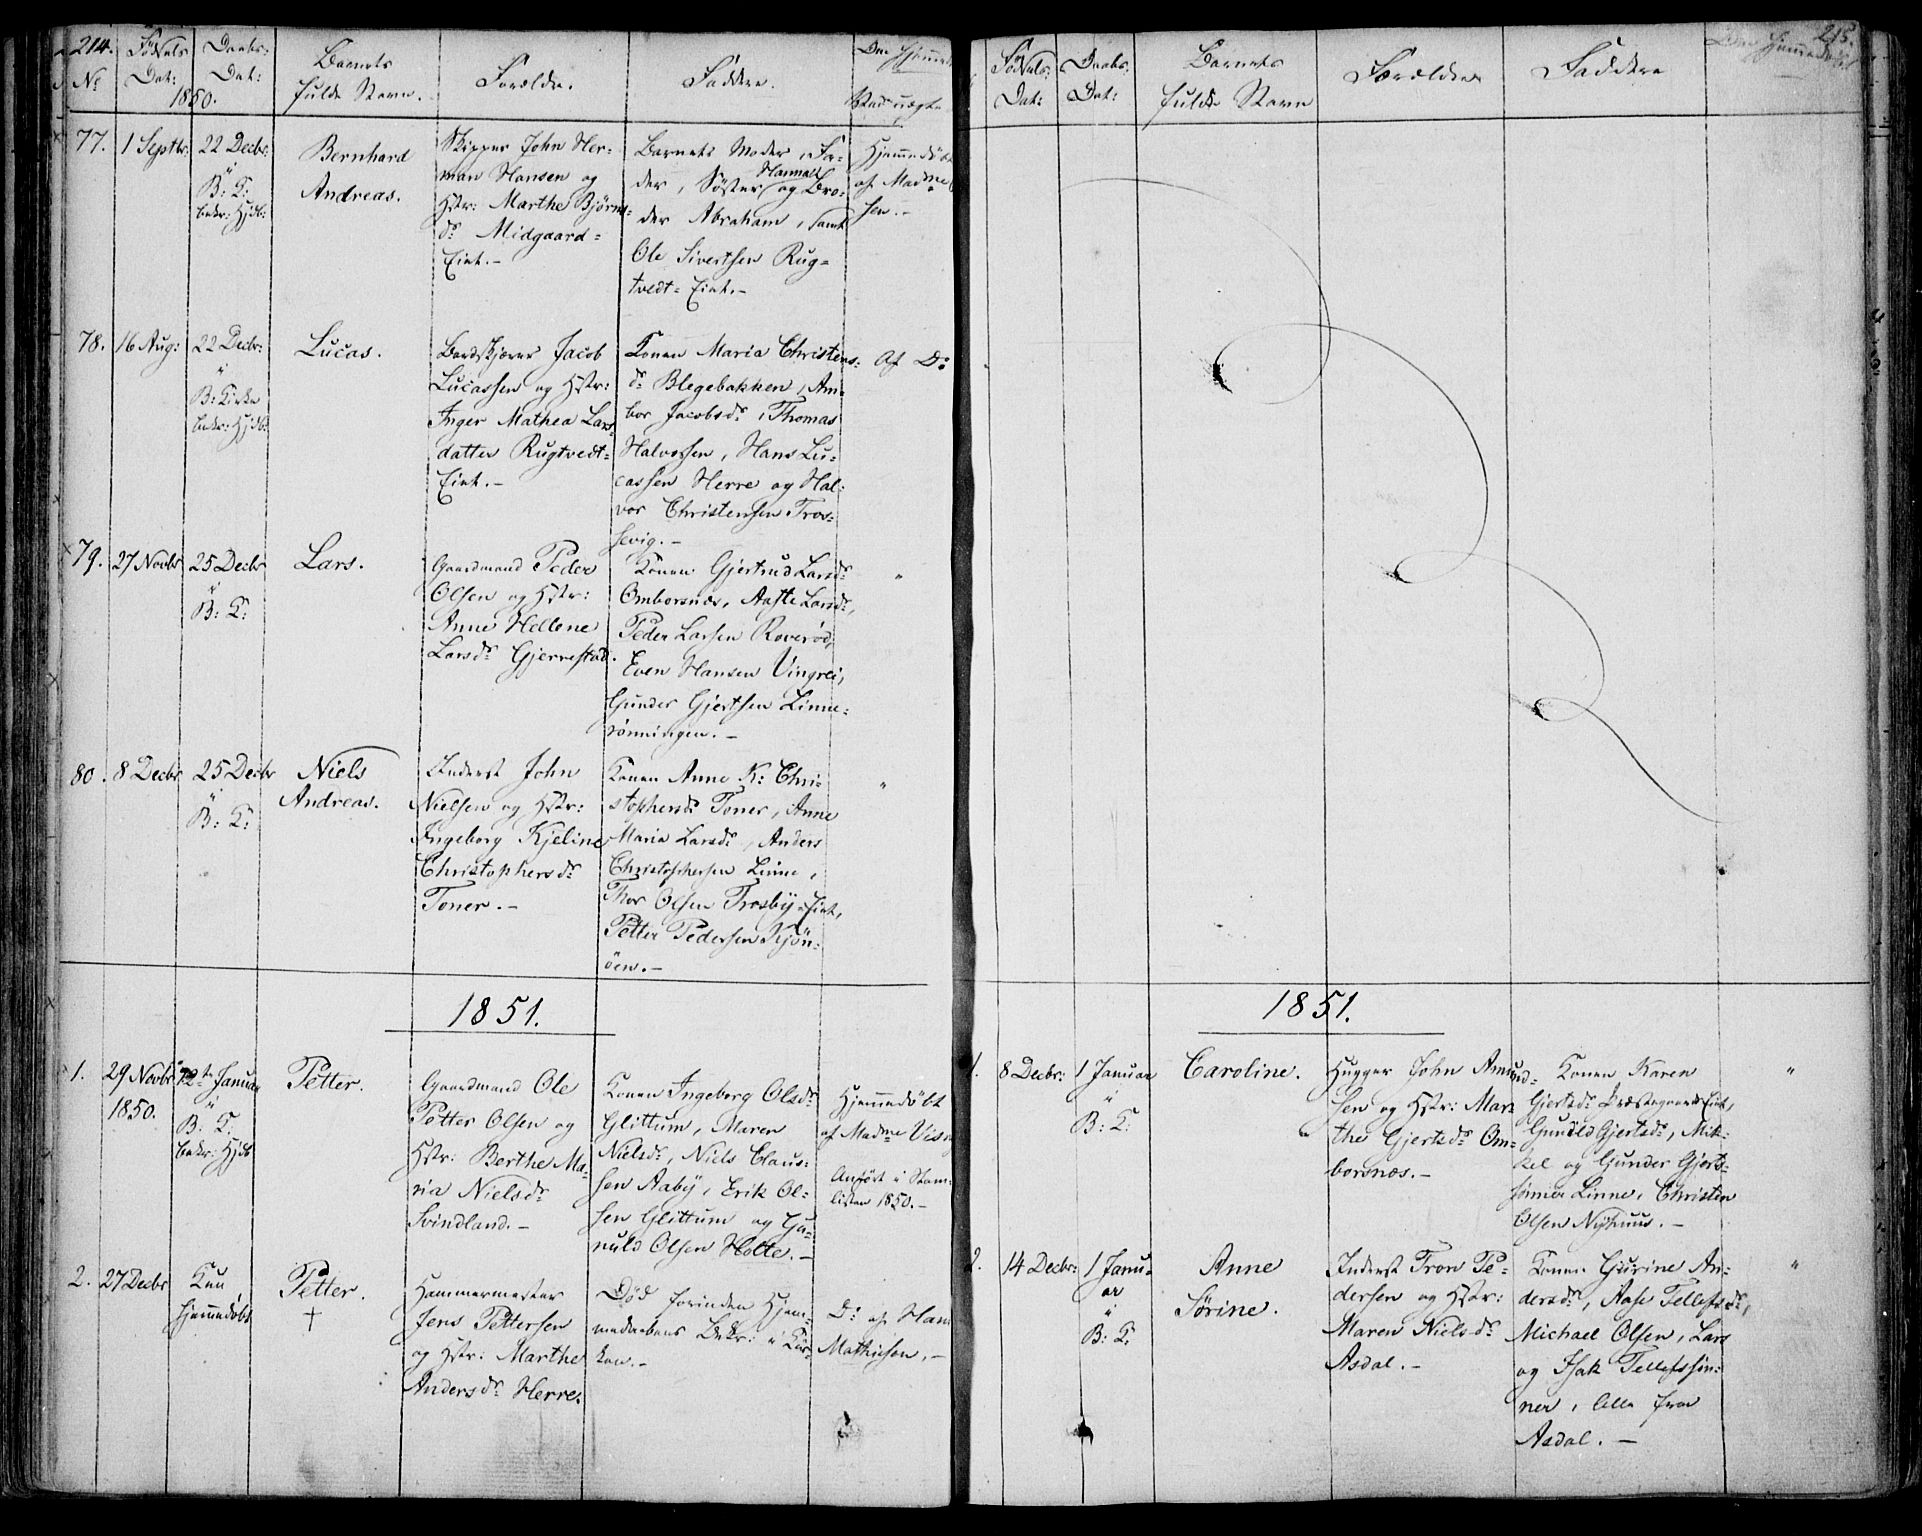 SAKO, Bamble kirkebøker, F/Fa/L0004: Ministerialbok nr. I 4, 1834-1853, s. 214-215